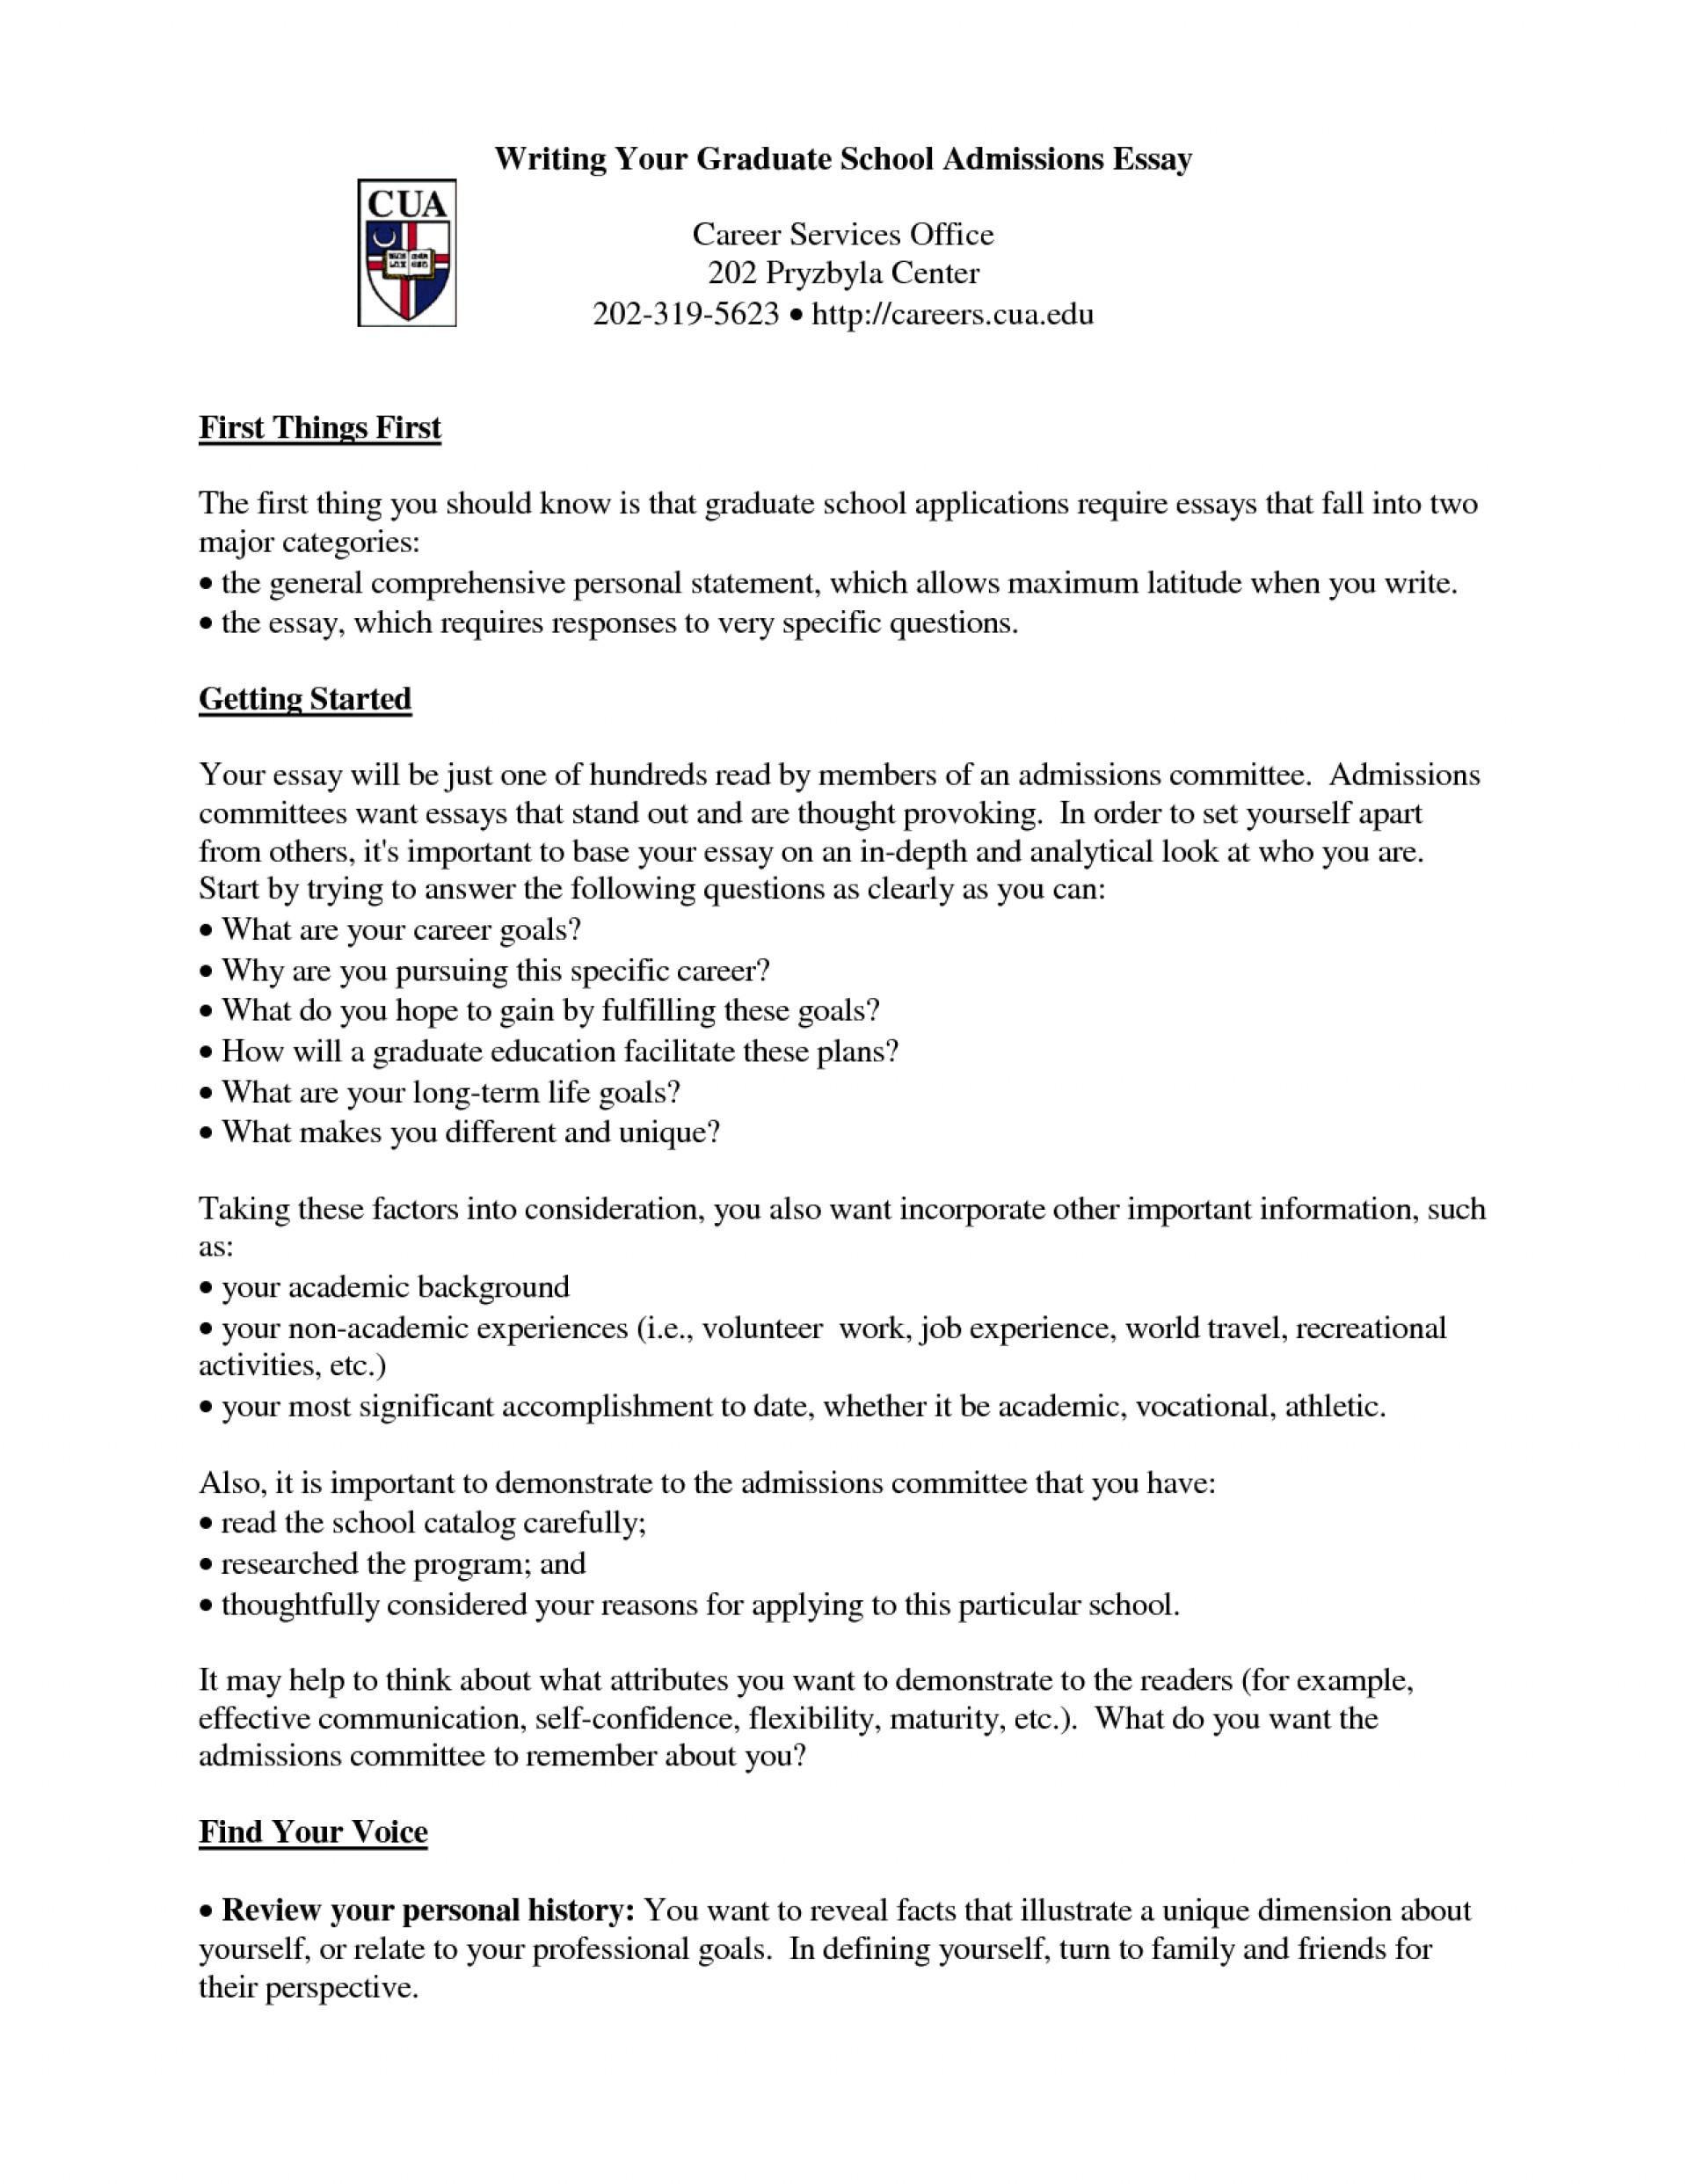 001 Graduate School Admission Essay Essaymedicalpersonalstatement615b0bd1 Frightening Examples Social Work Nursing Samples 1920